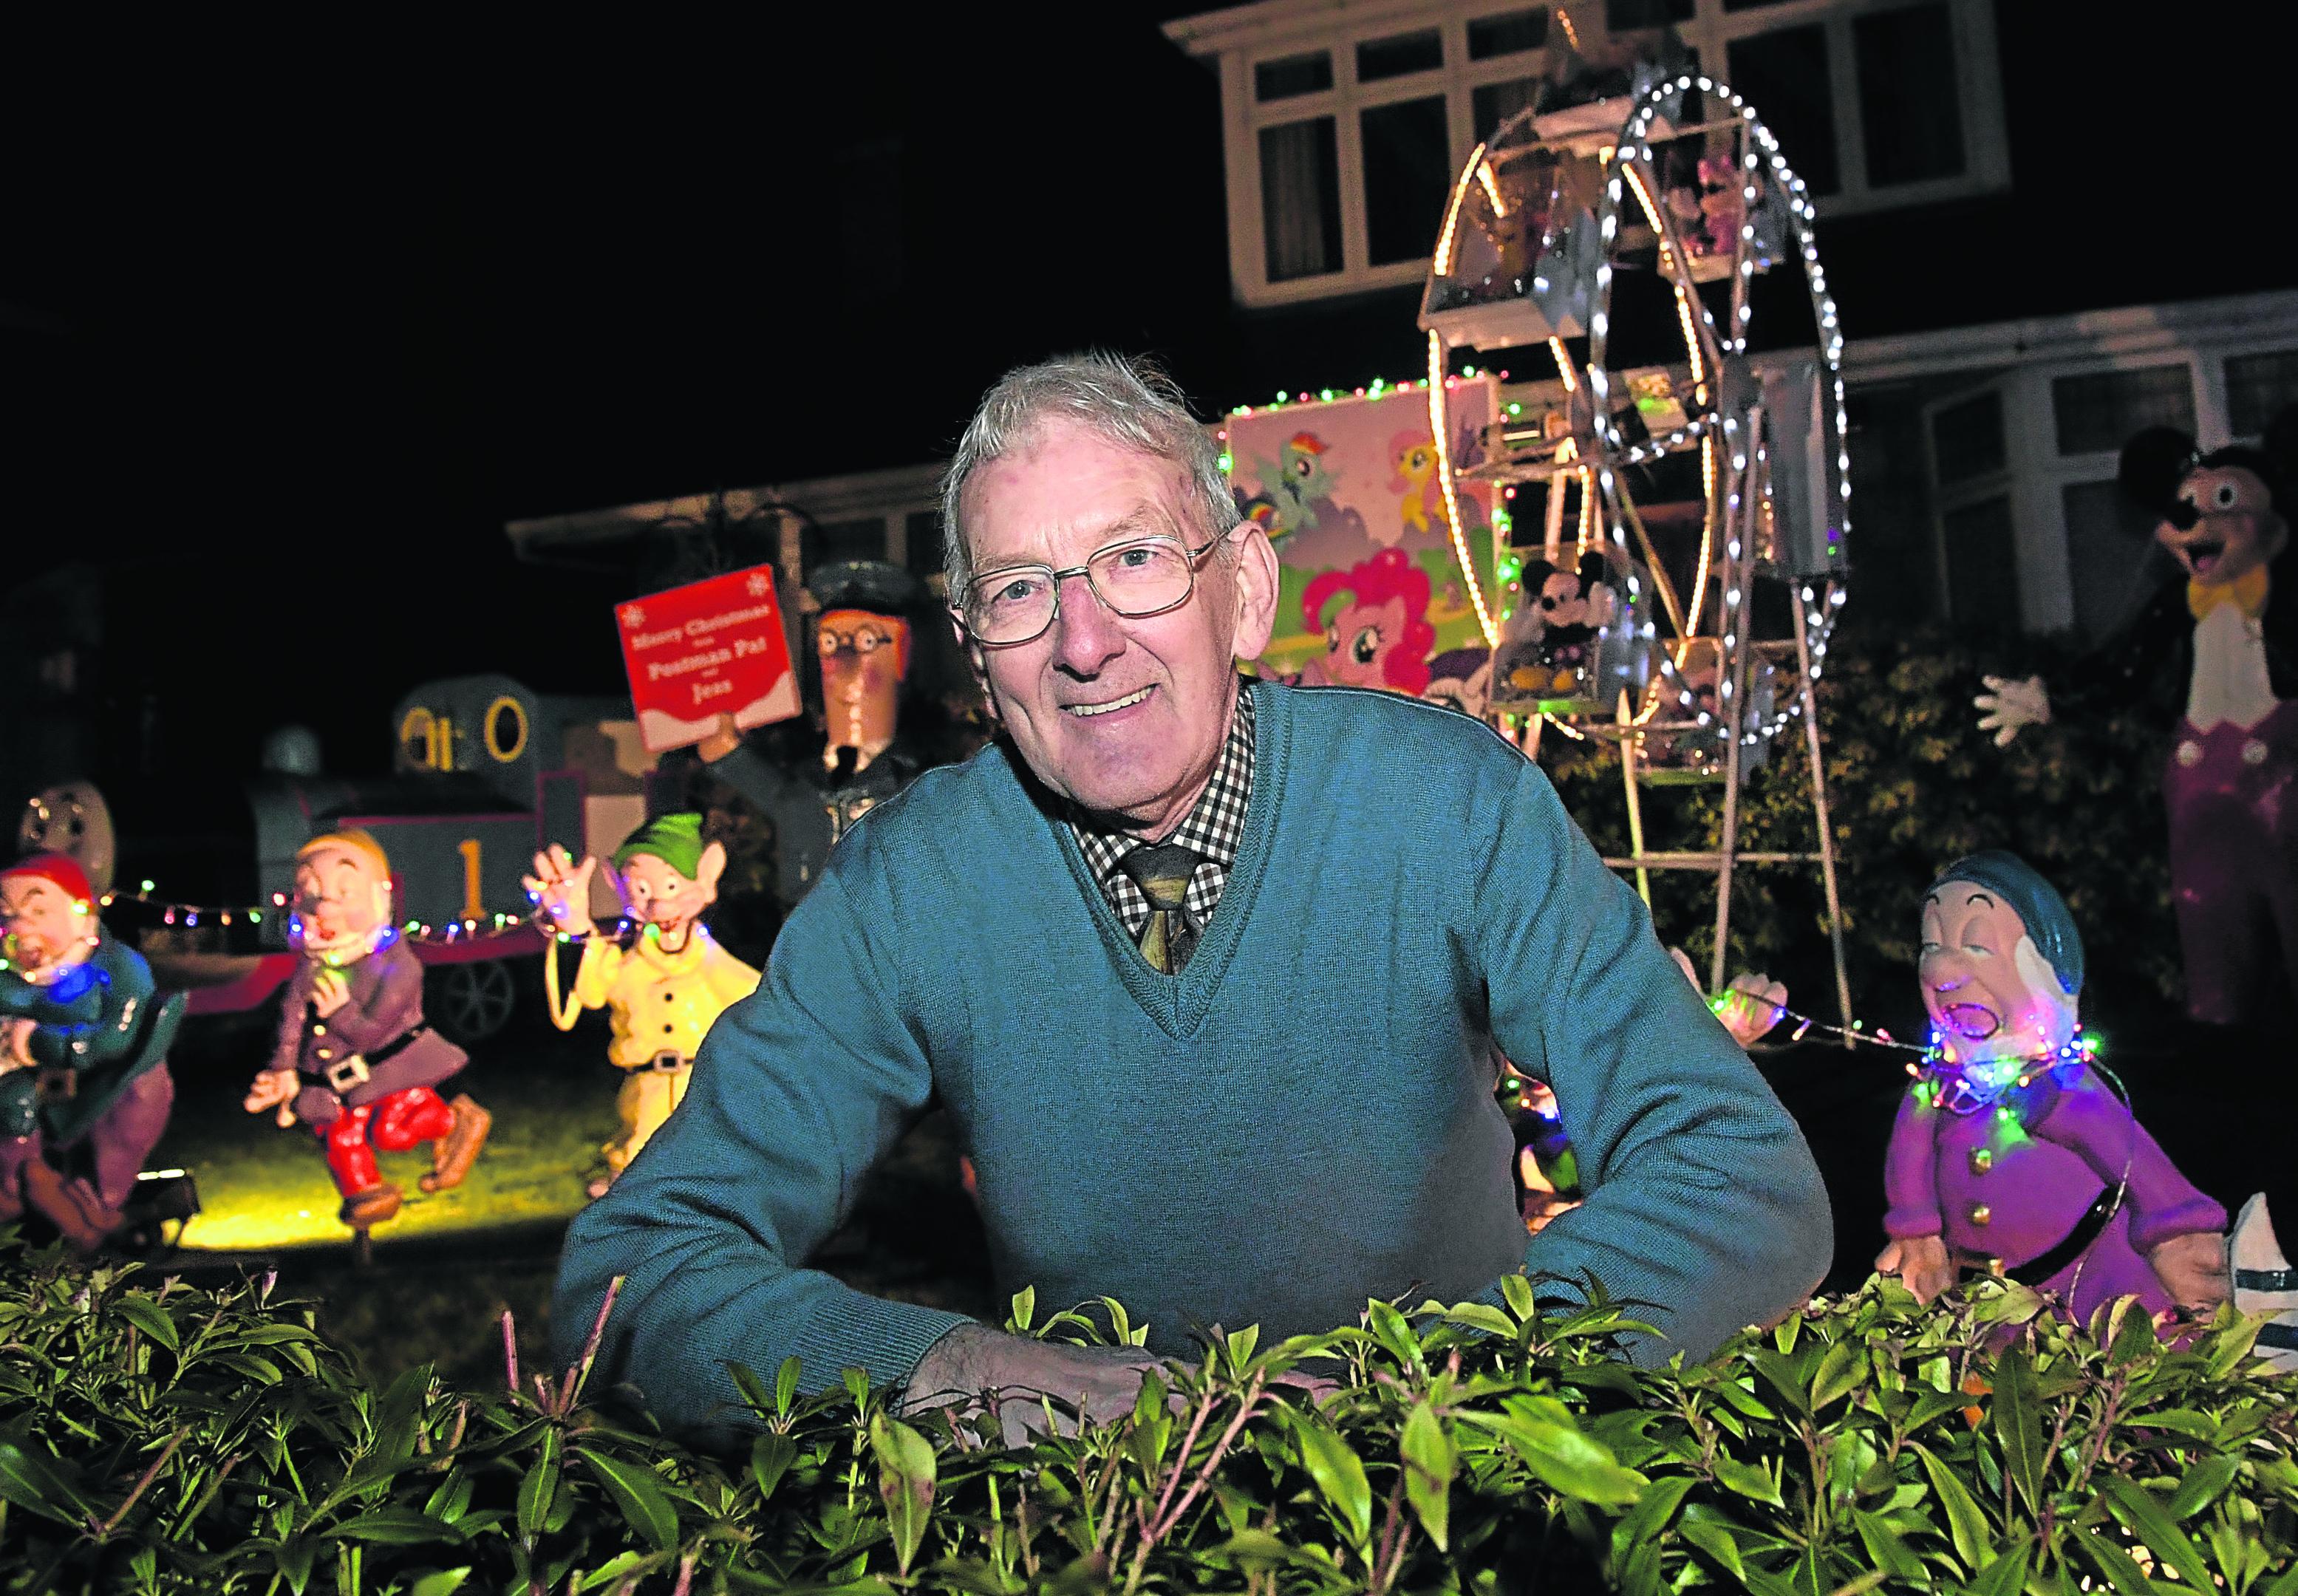 Eddie Stevenson's Christmas display in his garden